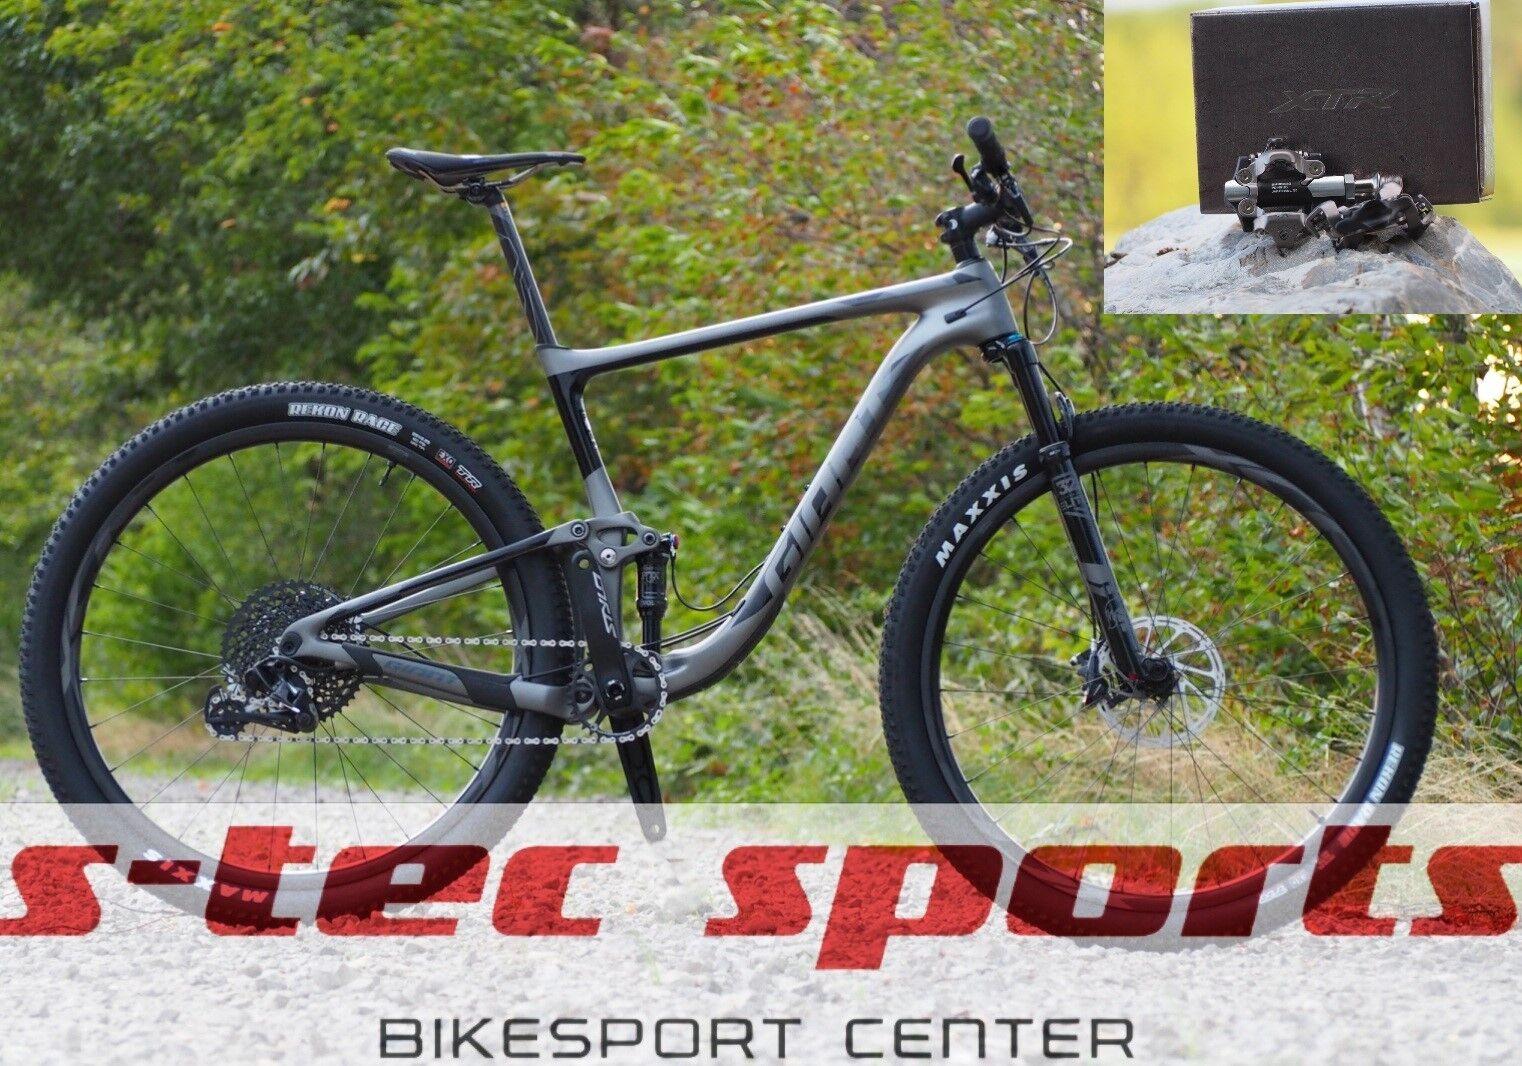 Shimano Xtr PD-M9100 Juego de Pedales para Gigante Anthem, Bicicletas 2019